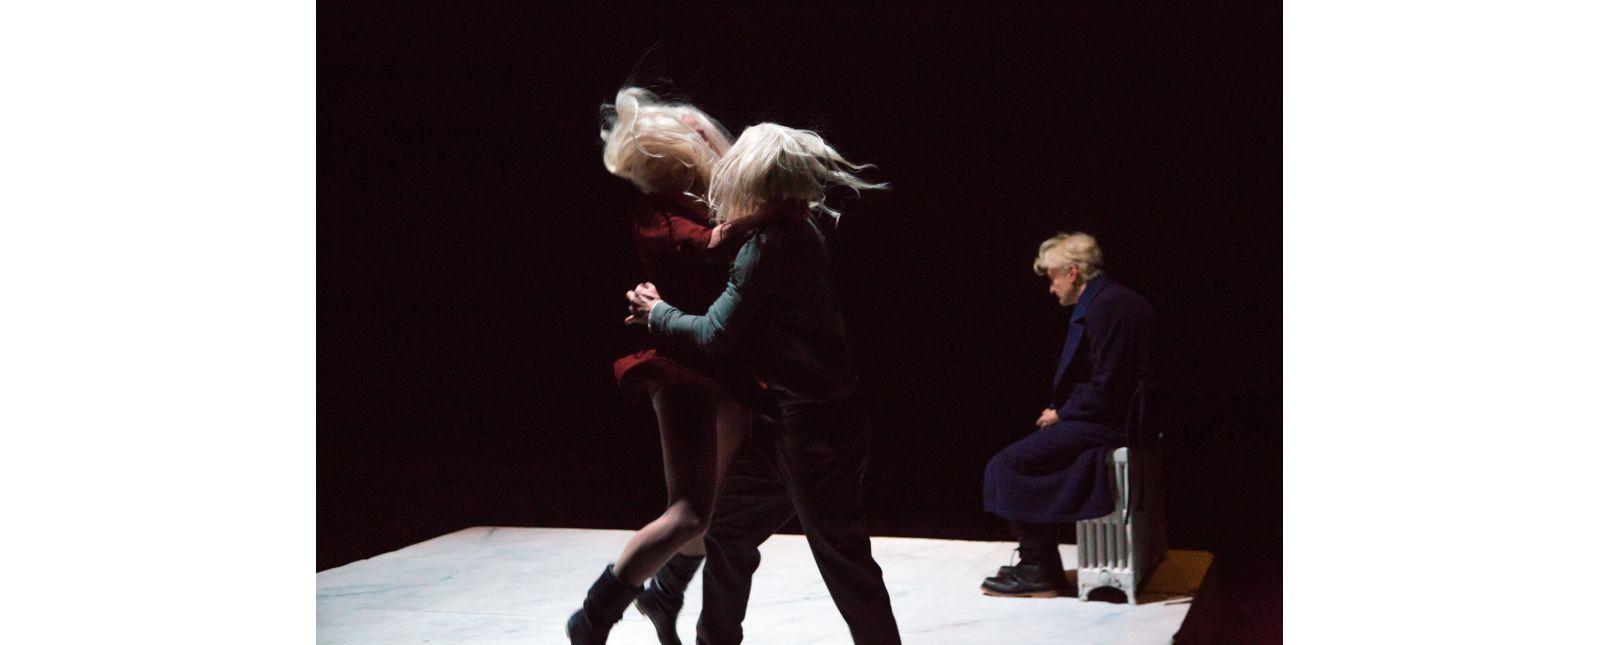 Totentanz // Marieke Kregel, Martin Hohner, Victor Calero // 2017 // Laura Nickel